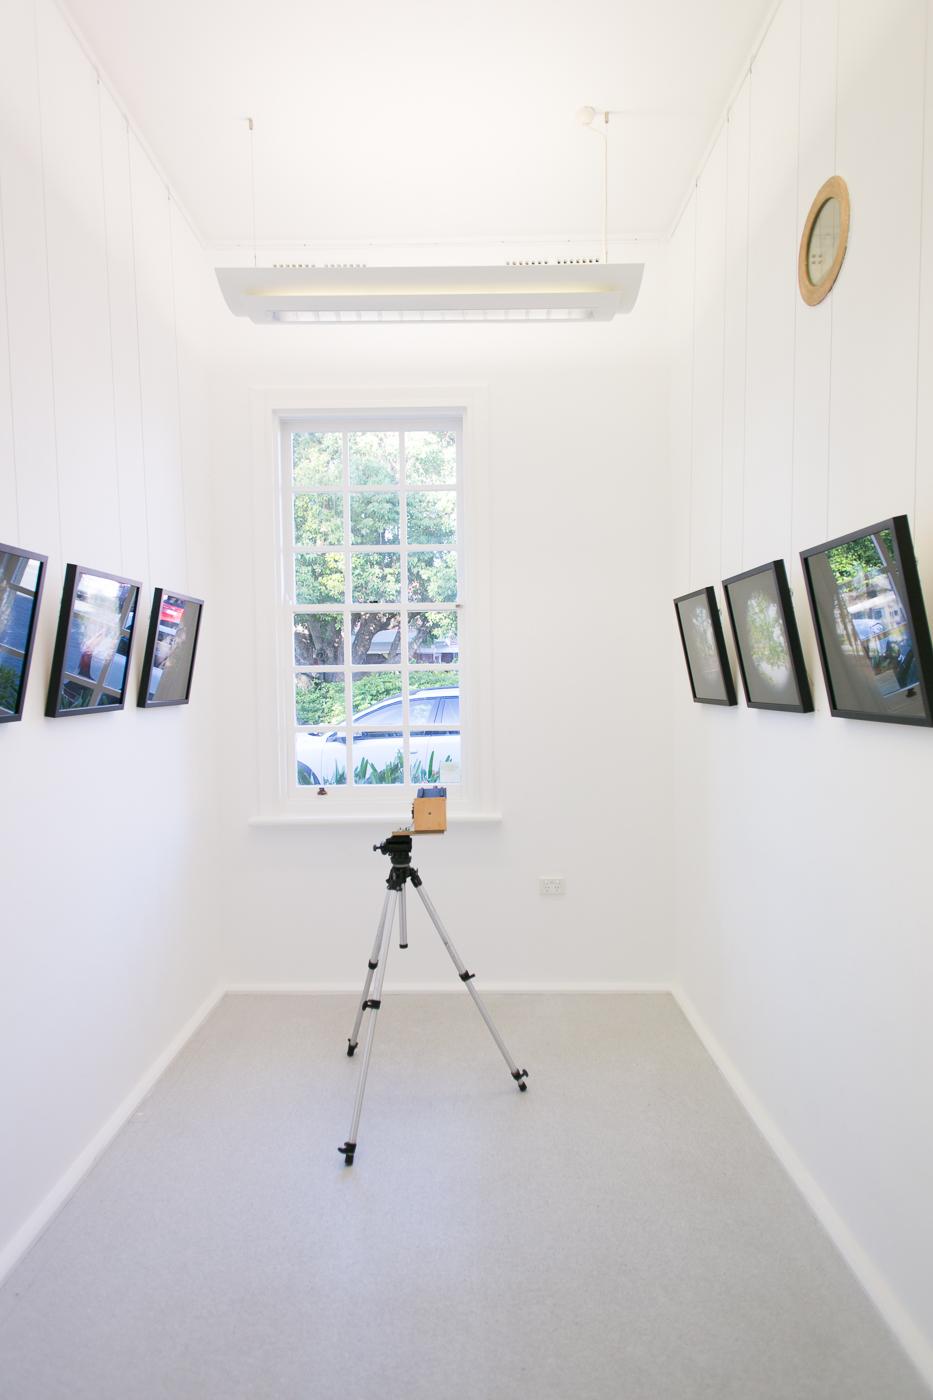 04 Gallery image 2 (Merrick Belyea Installation Image)